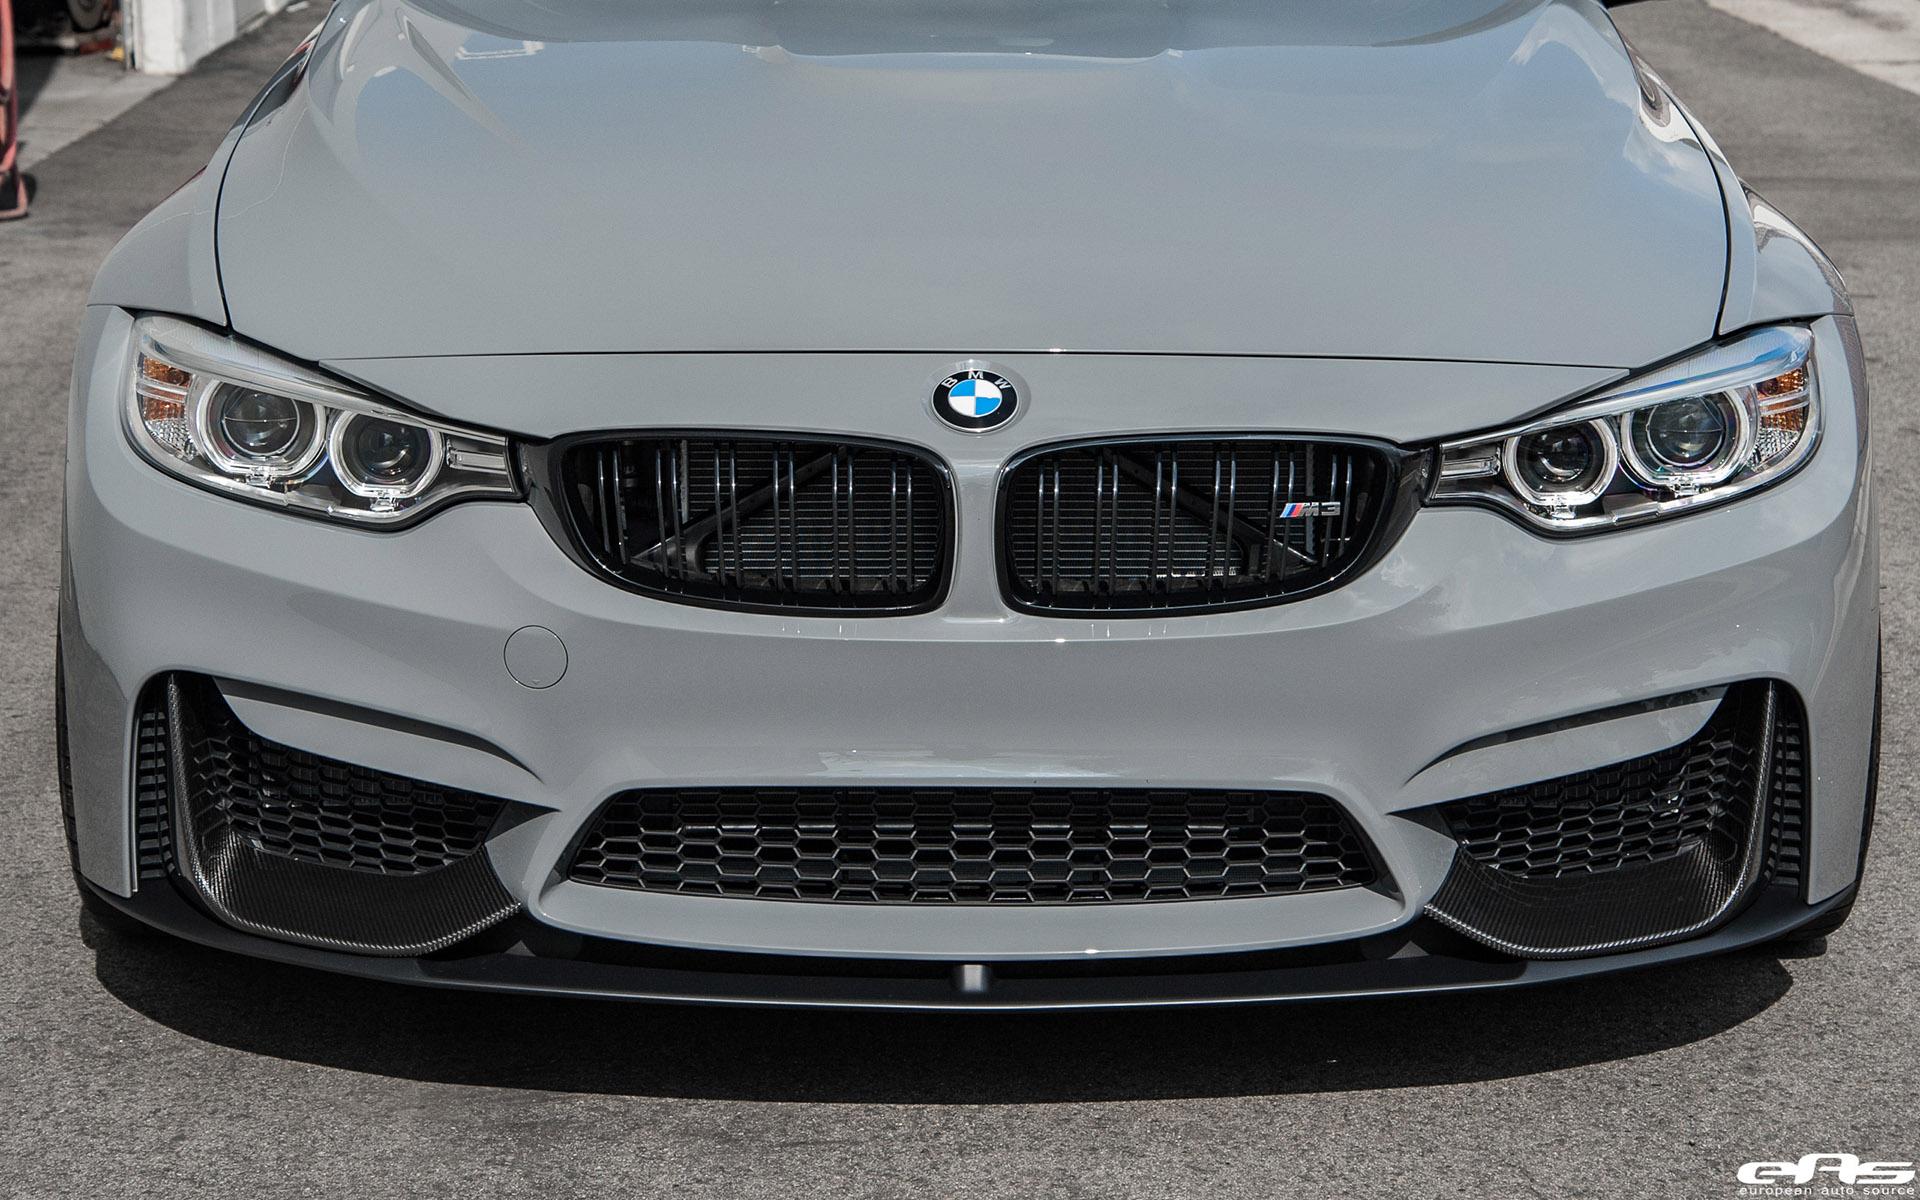 Bmw M2 Cs >> Nardo Gray BMW F80 M3 Gets Aftermarket Upgrades